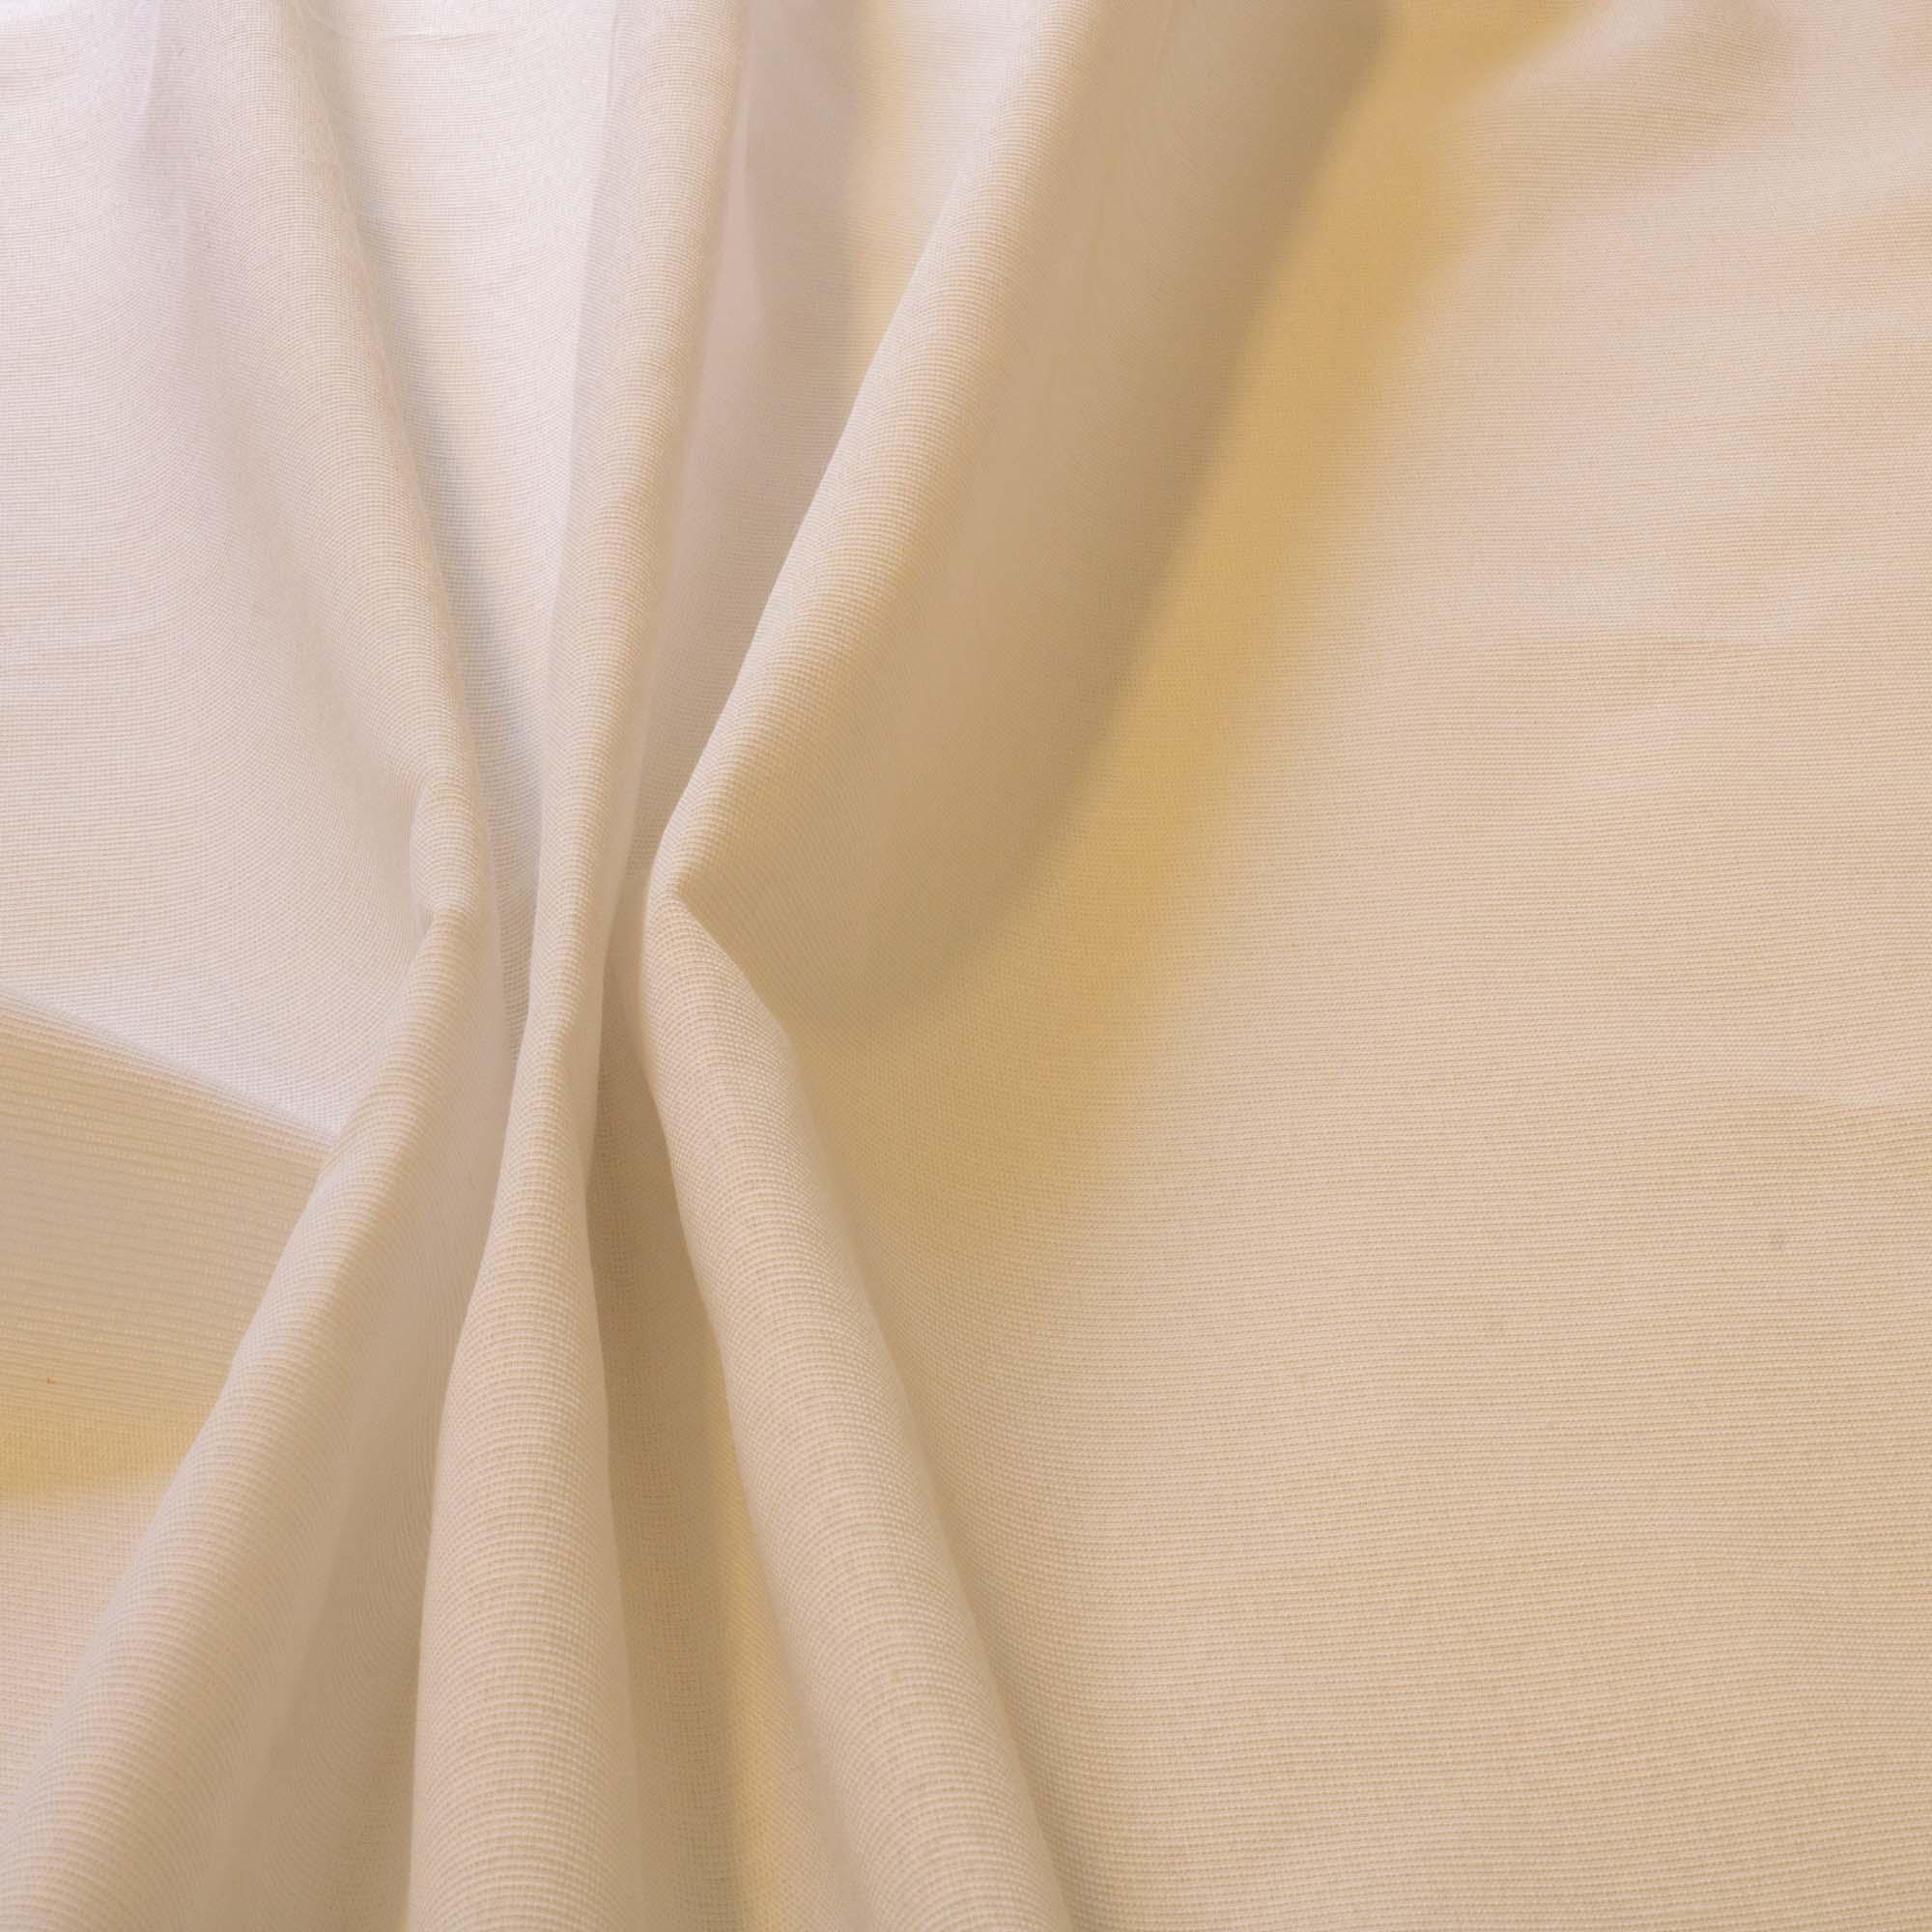 Tecido Gorgurinho Branco 1,50 m Largura